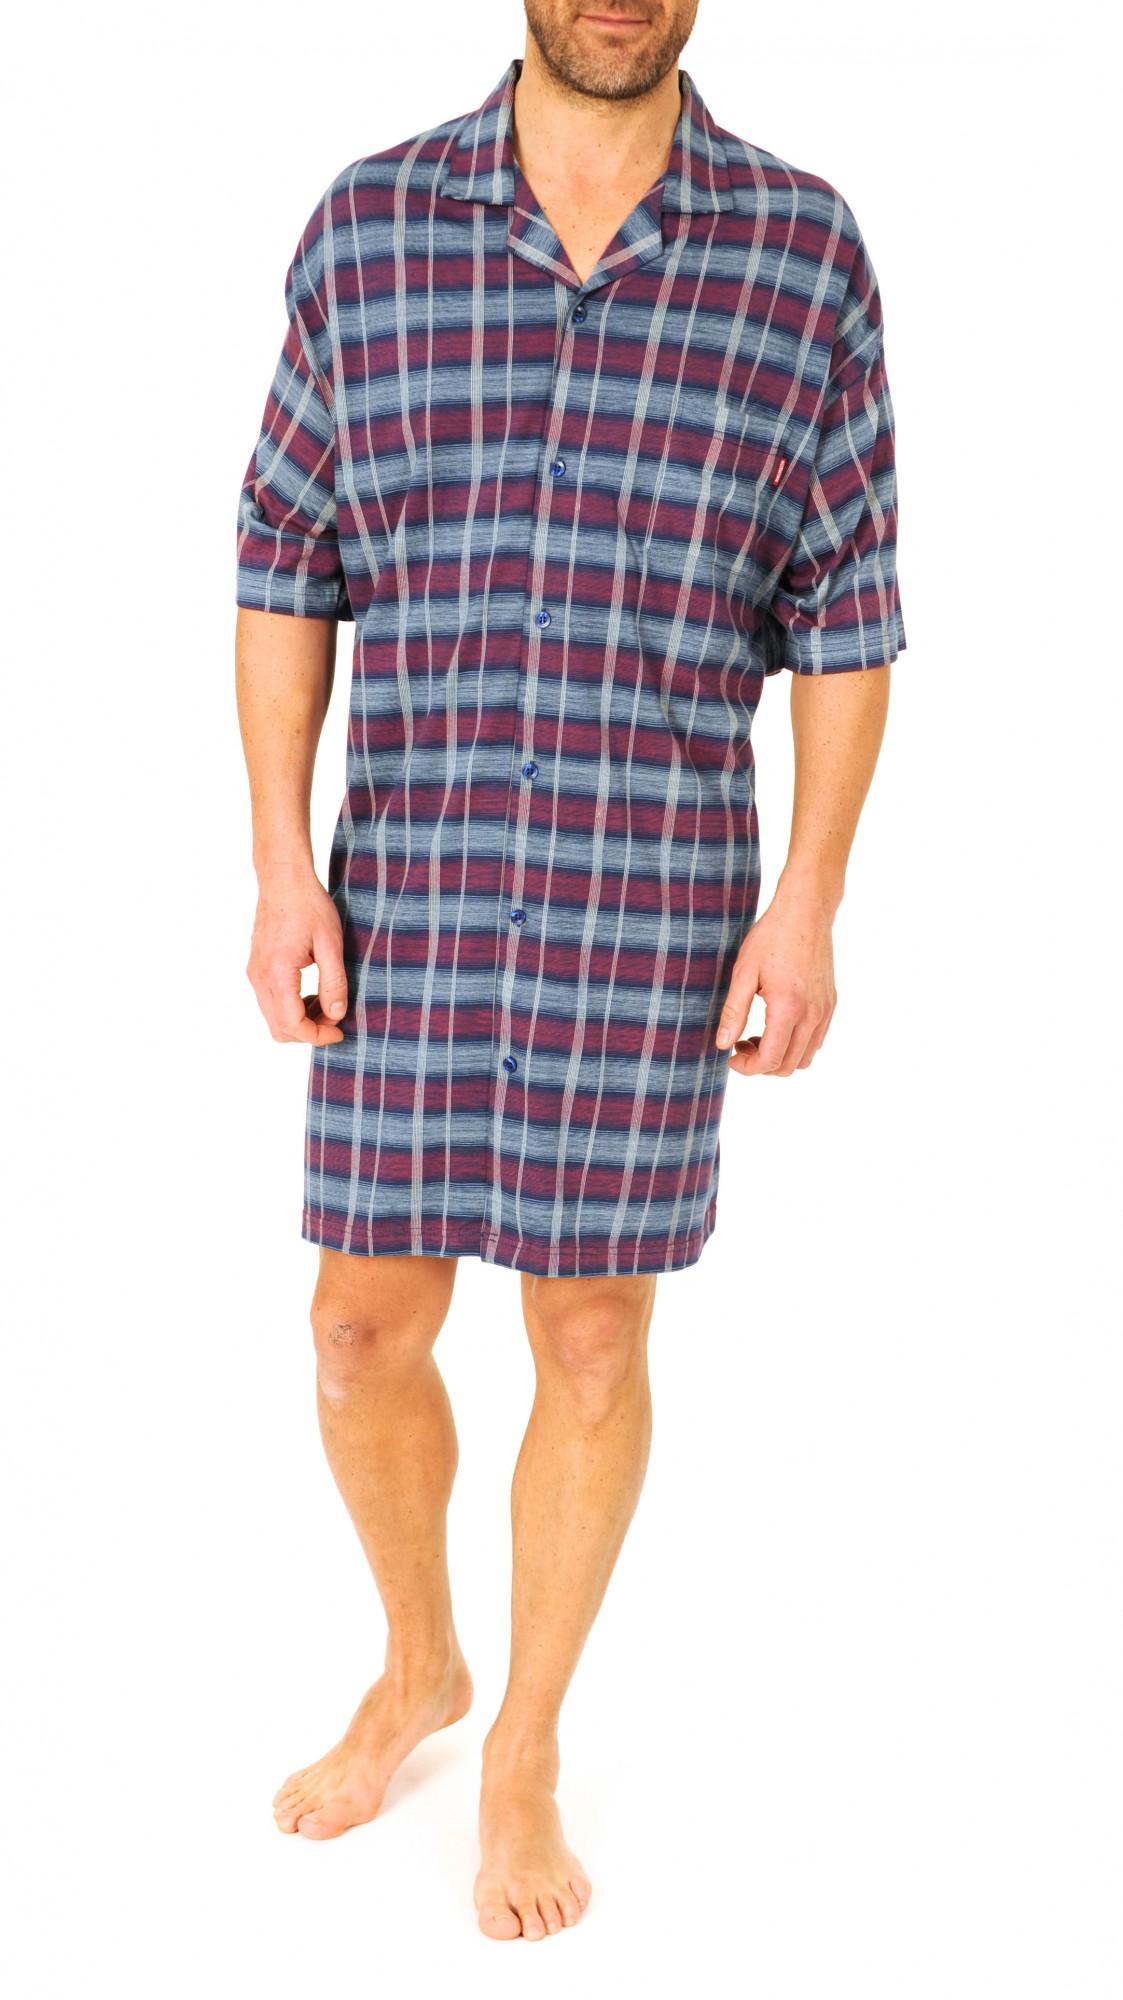 Herren Pflegenachthemd kurzarm, 53045 – Bild 3